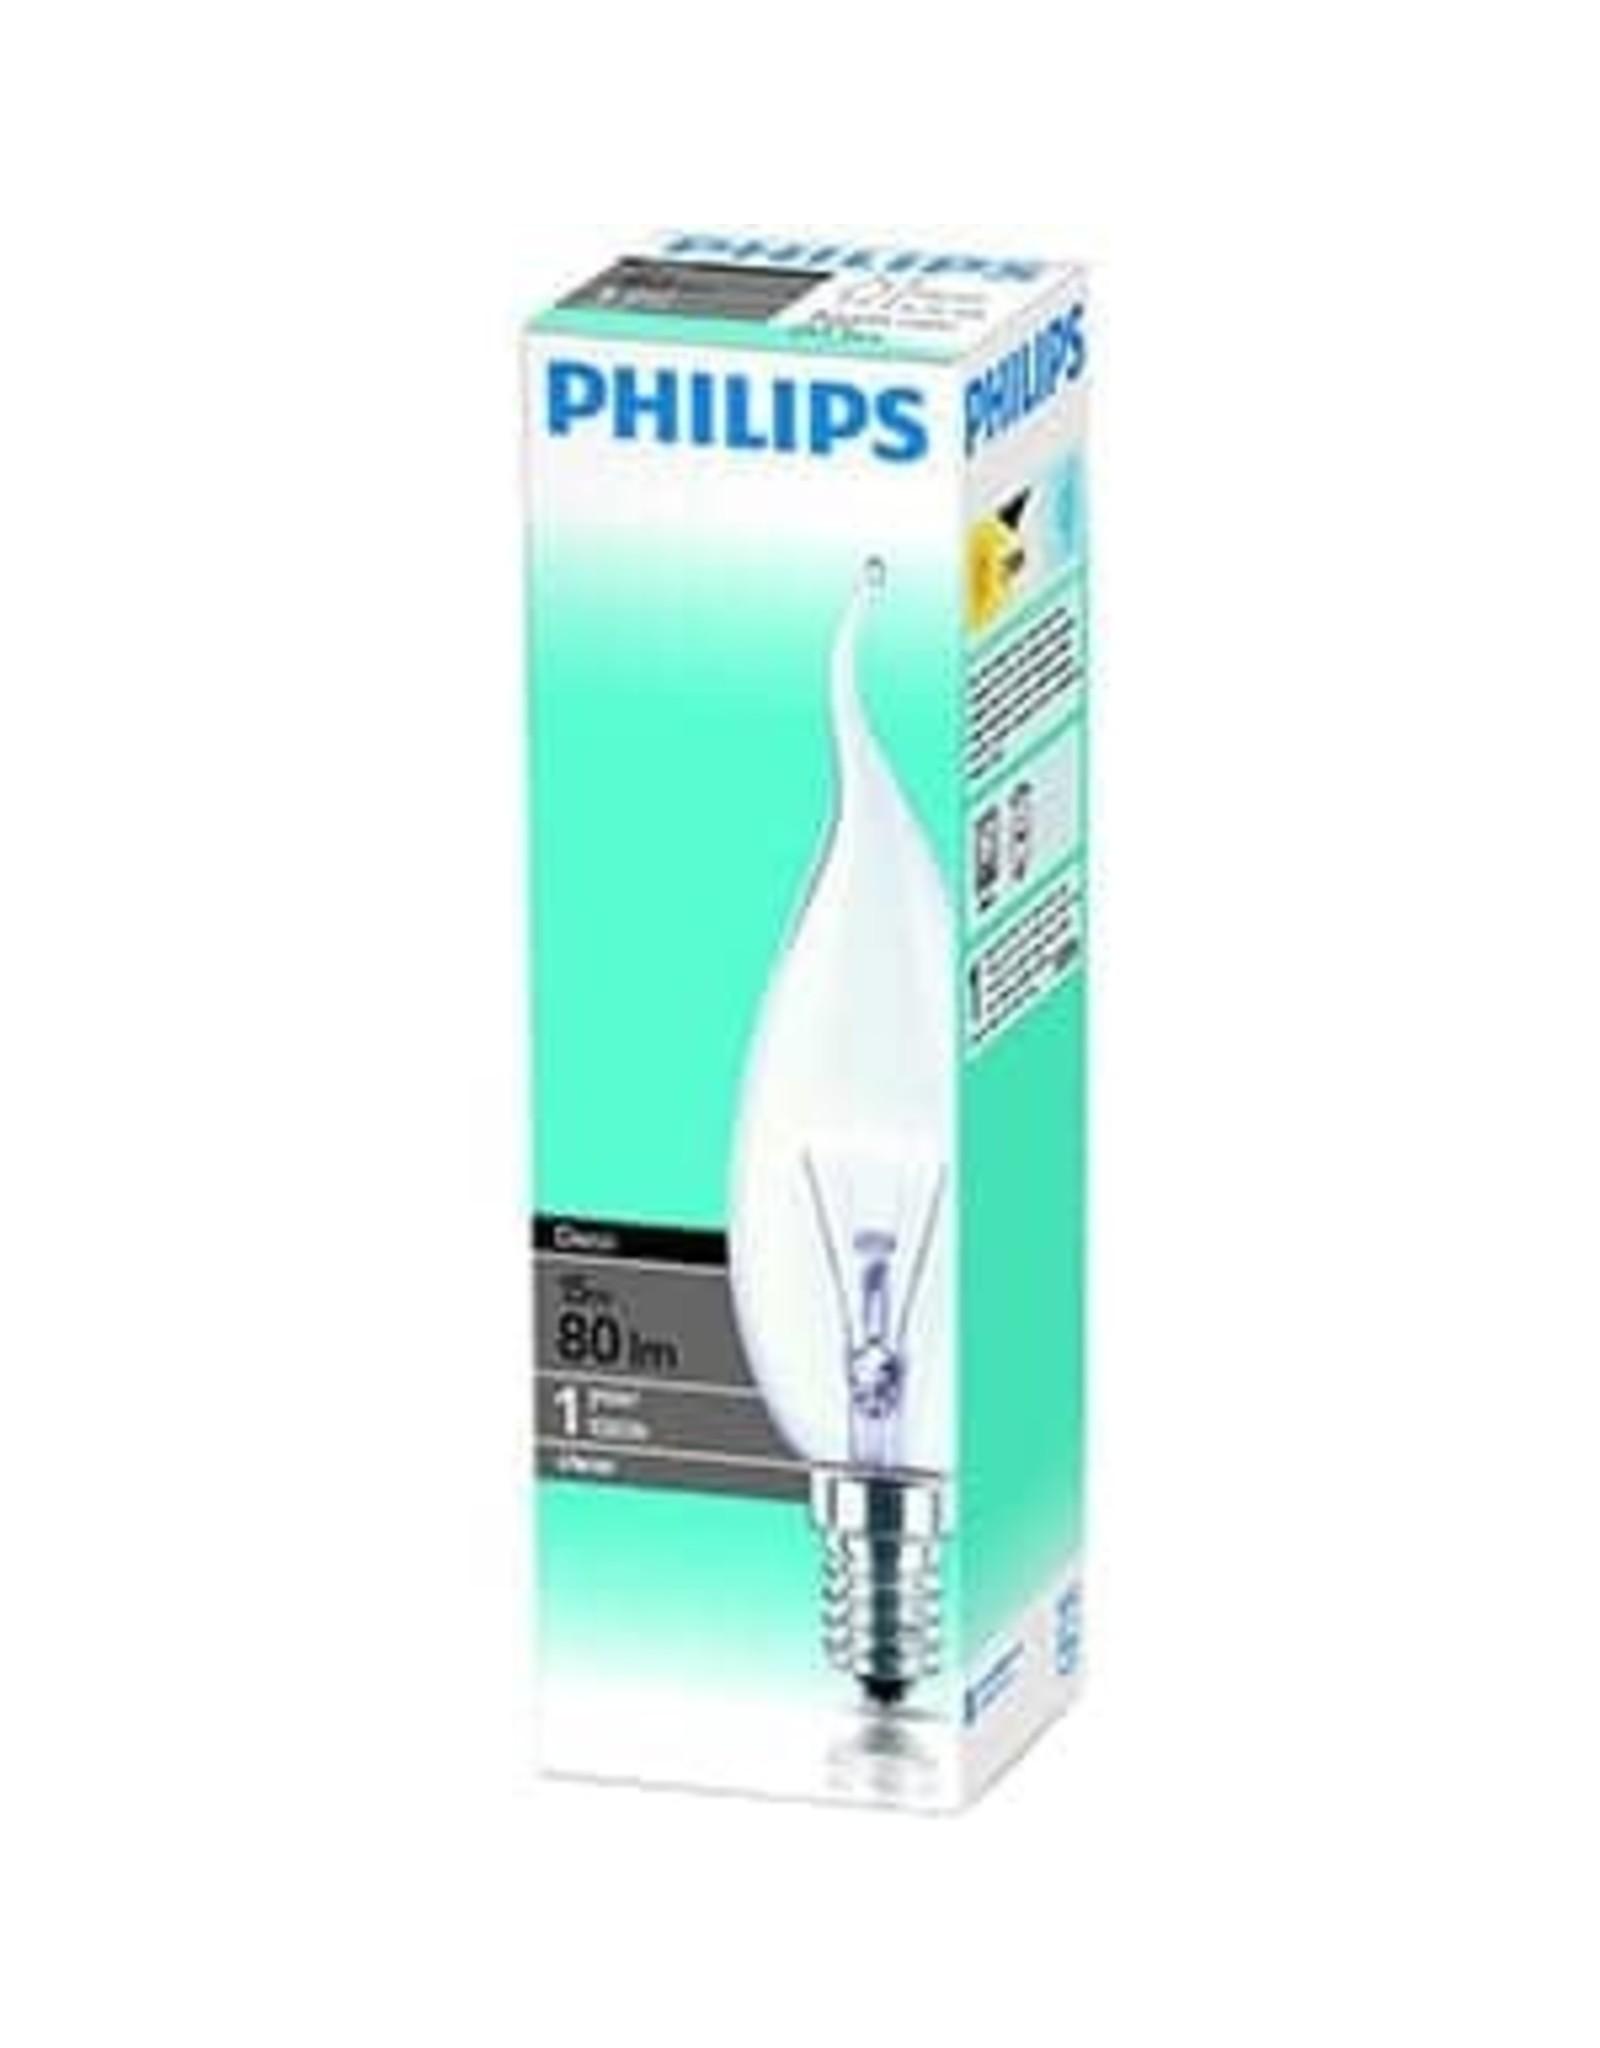 PHILIPS Philips gloeilamp kaars bended tip 15W E14 230V BXS35